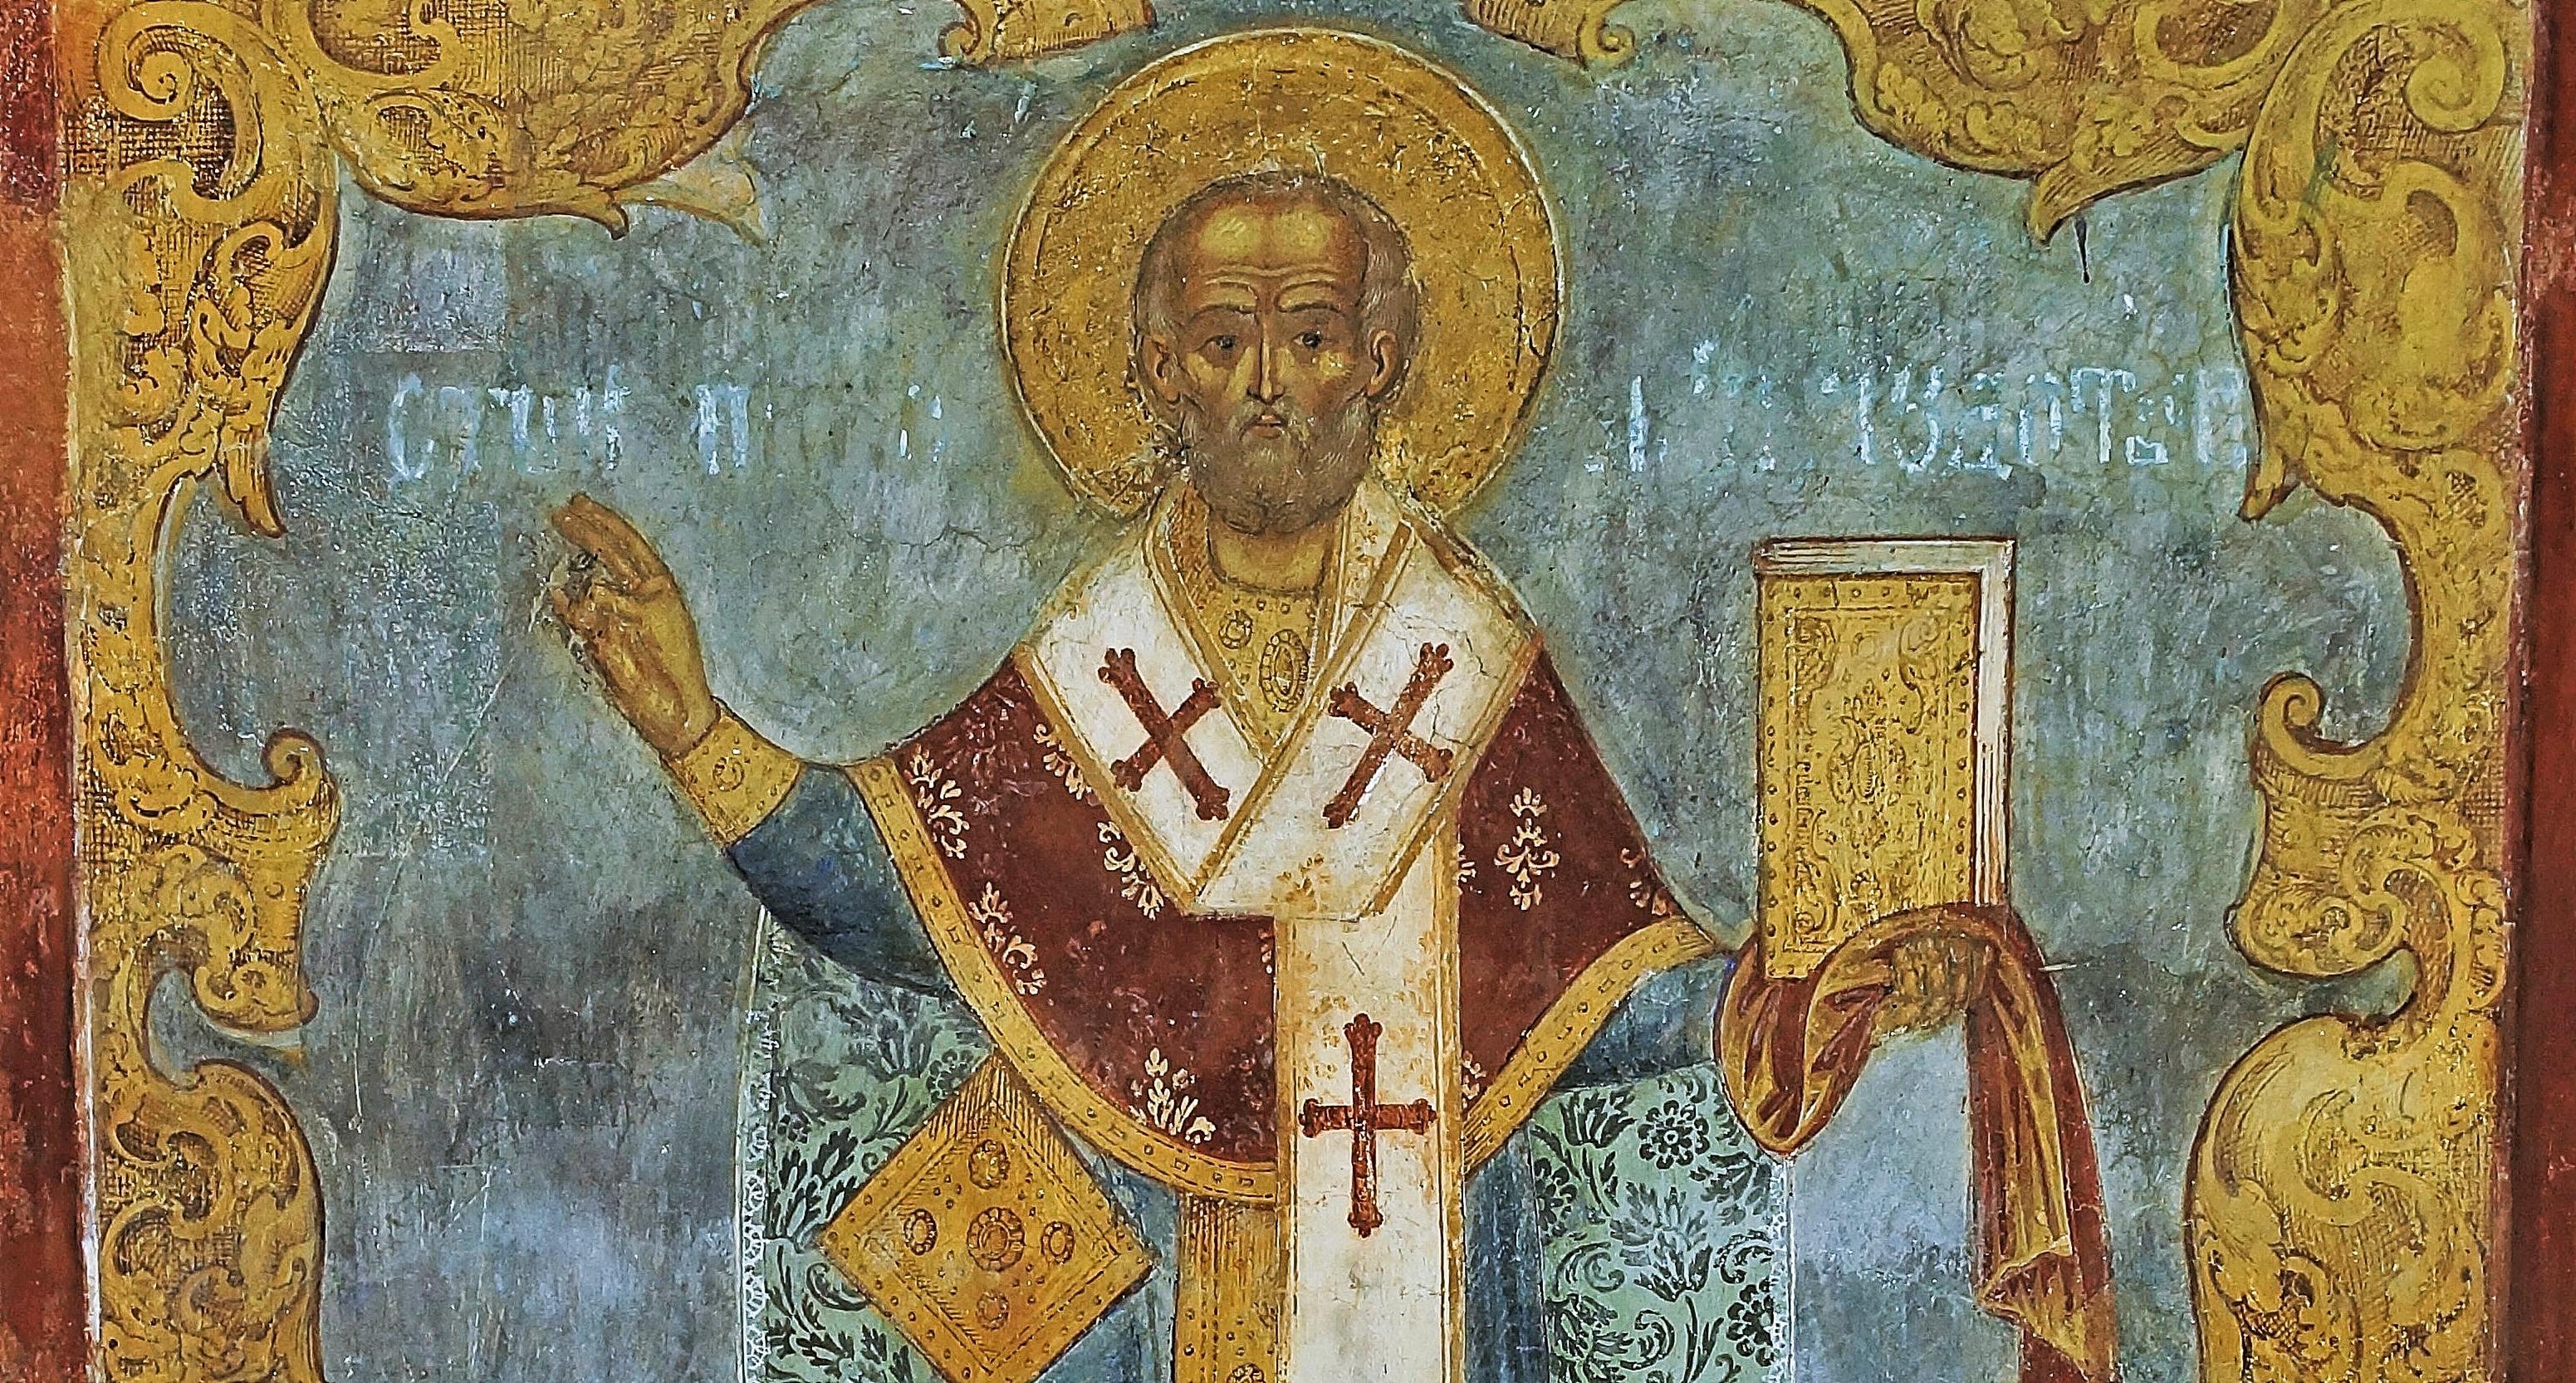 st nicholas, saint nicholas, st nicholas day,